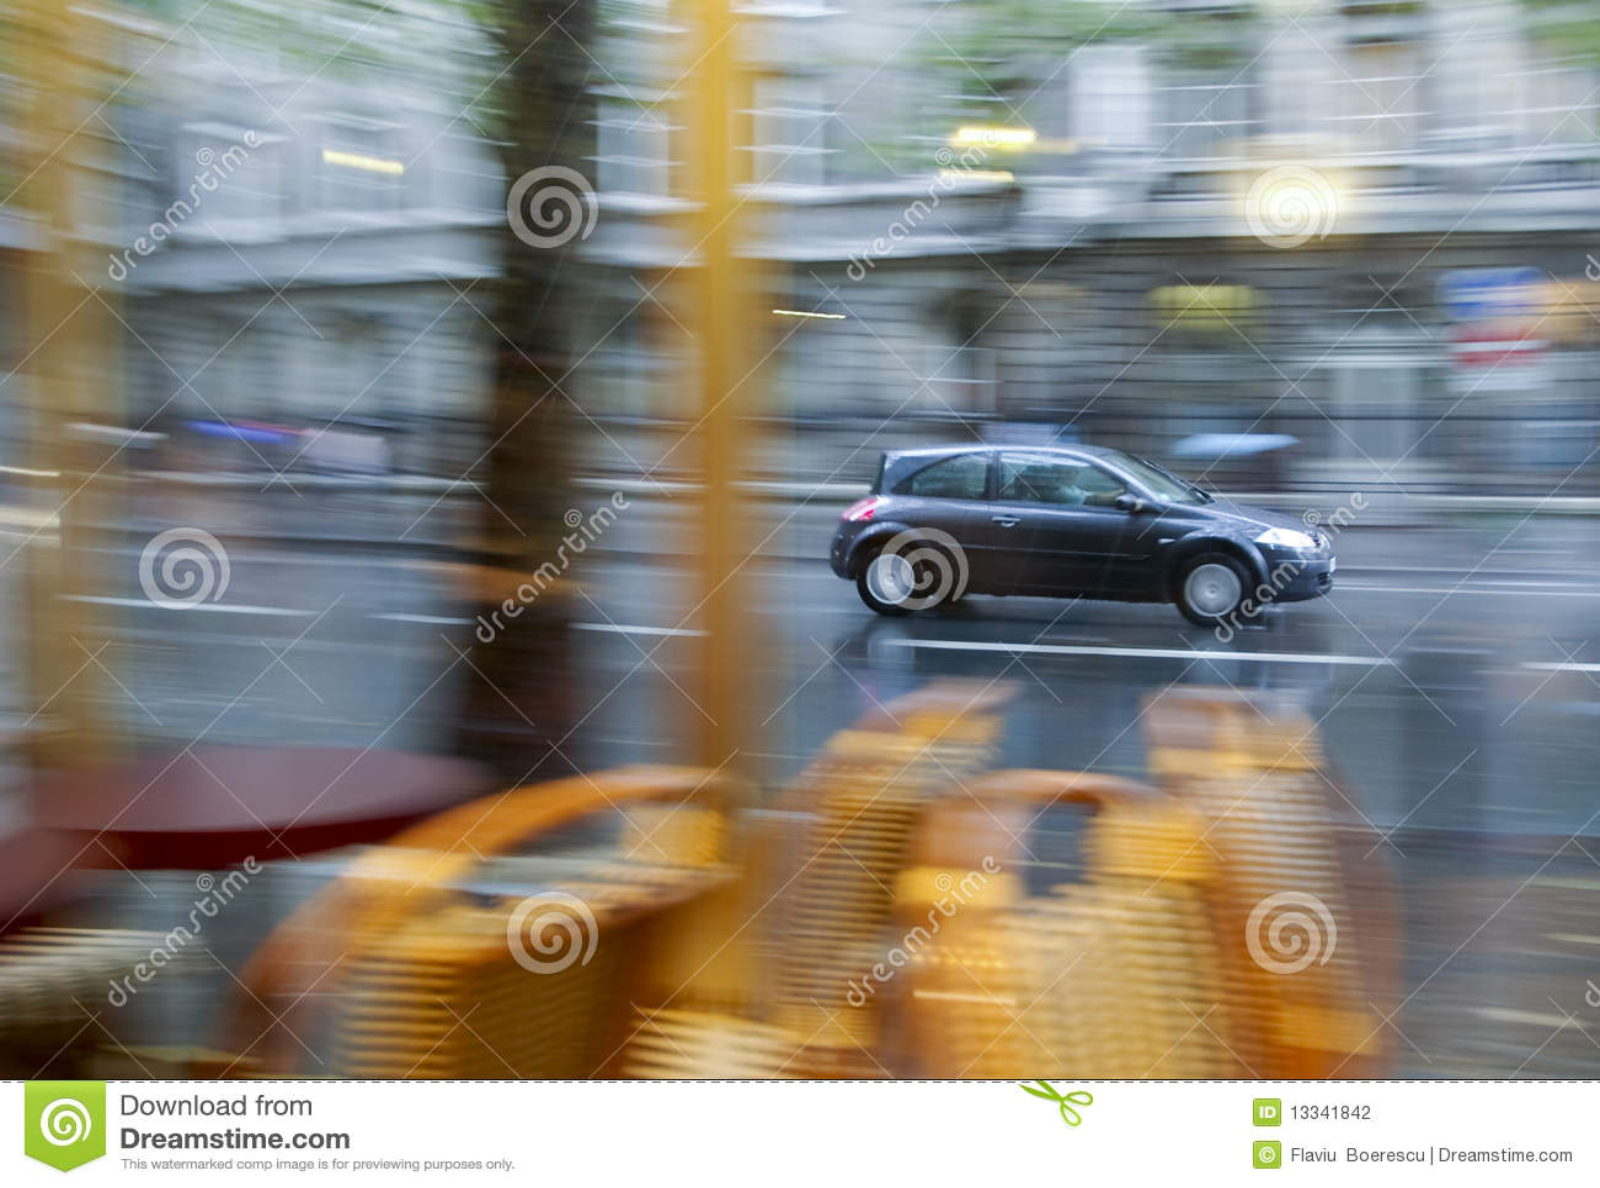 Panning effect on car rainy day wet asphalt views from bar interior